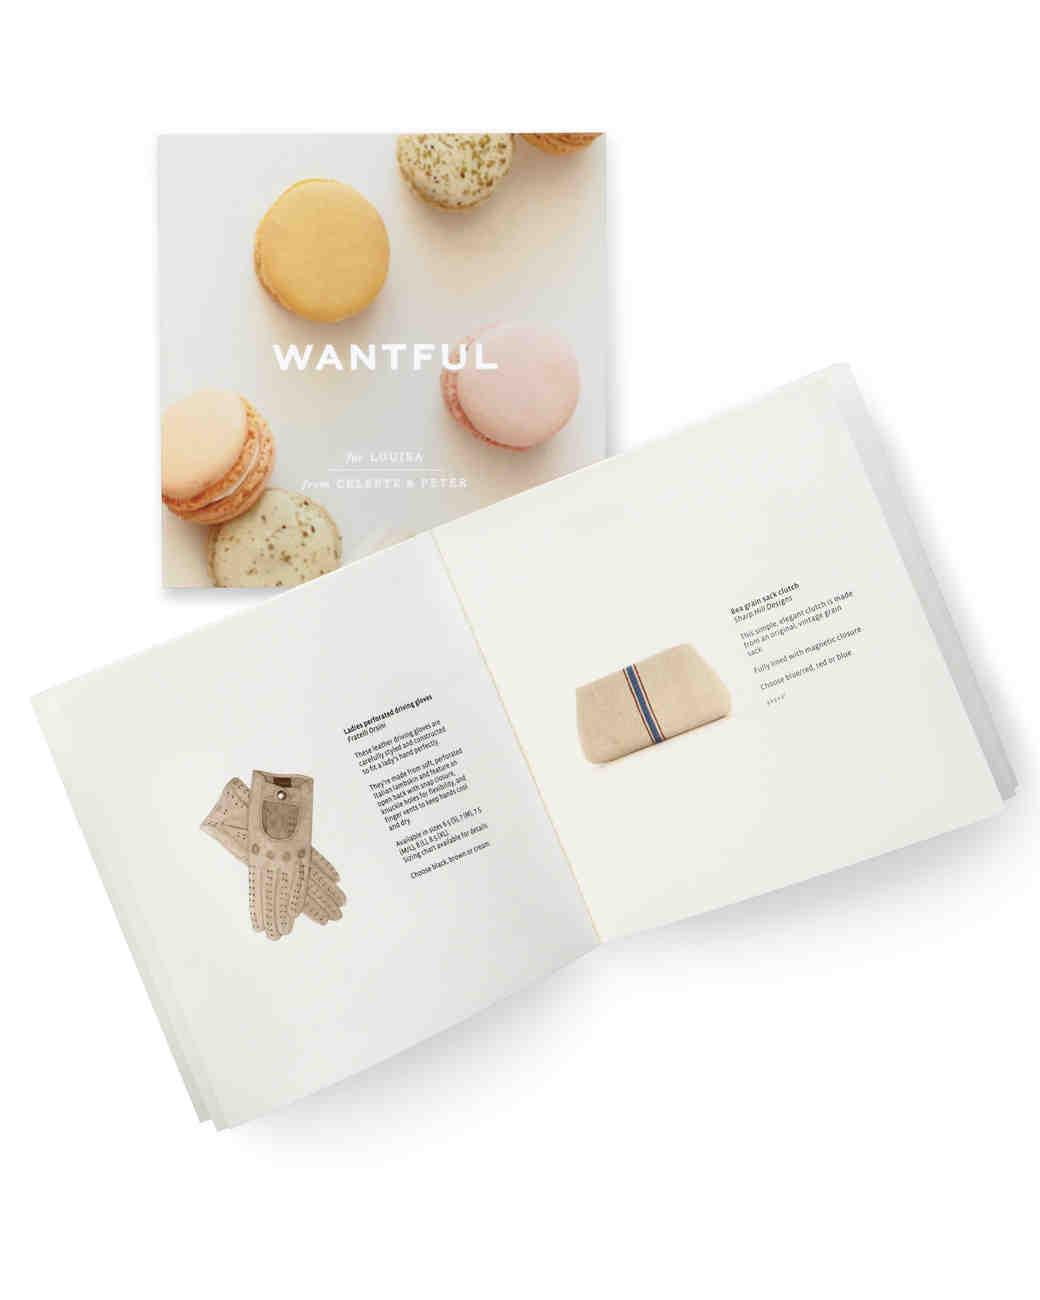 wantful-book-mwd109353.jpg